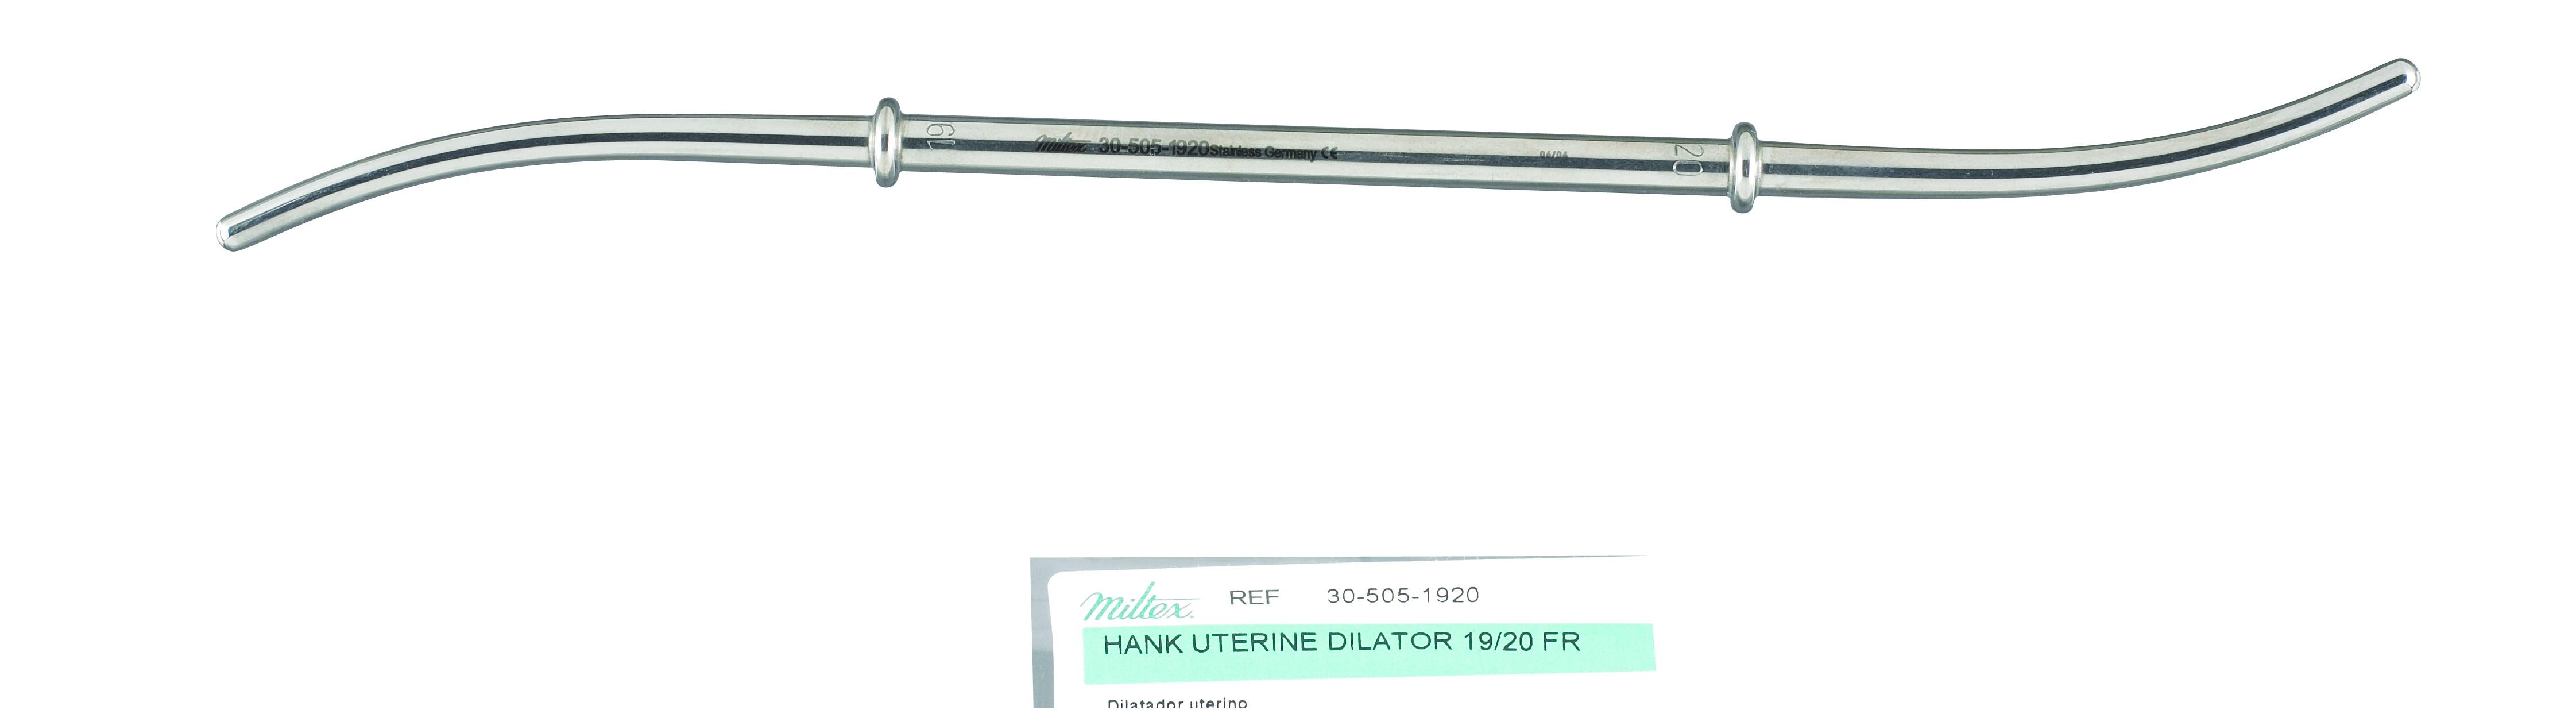 hank-uterine-dilators-10-1-2-267-cm-double-end-19-20-fr63-66-mm-30-505-1920-miltex.jpg